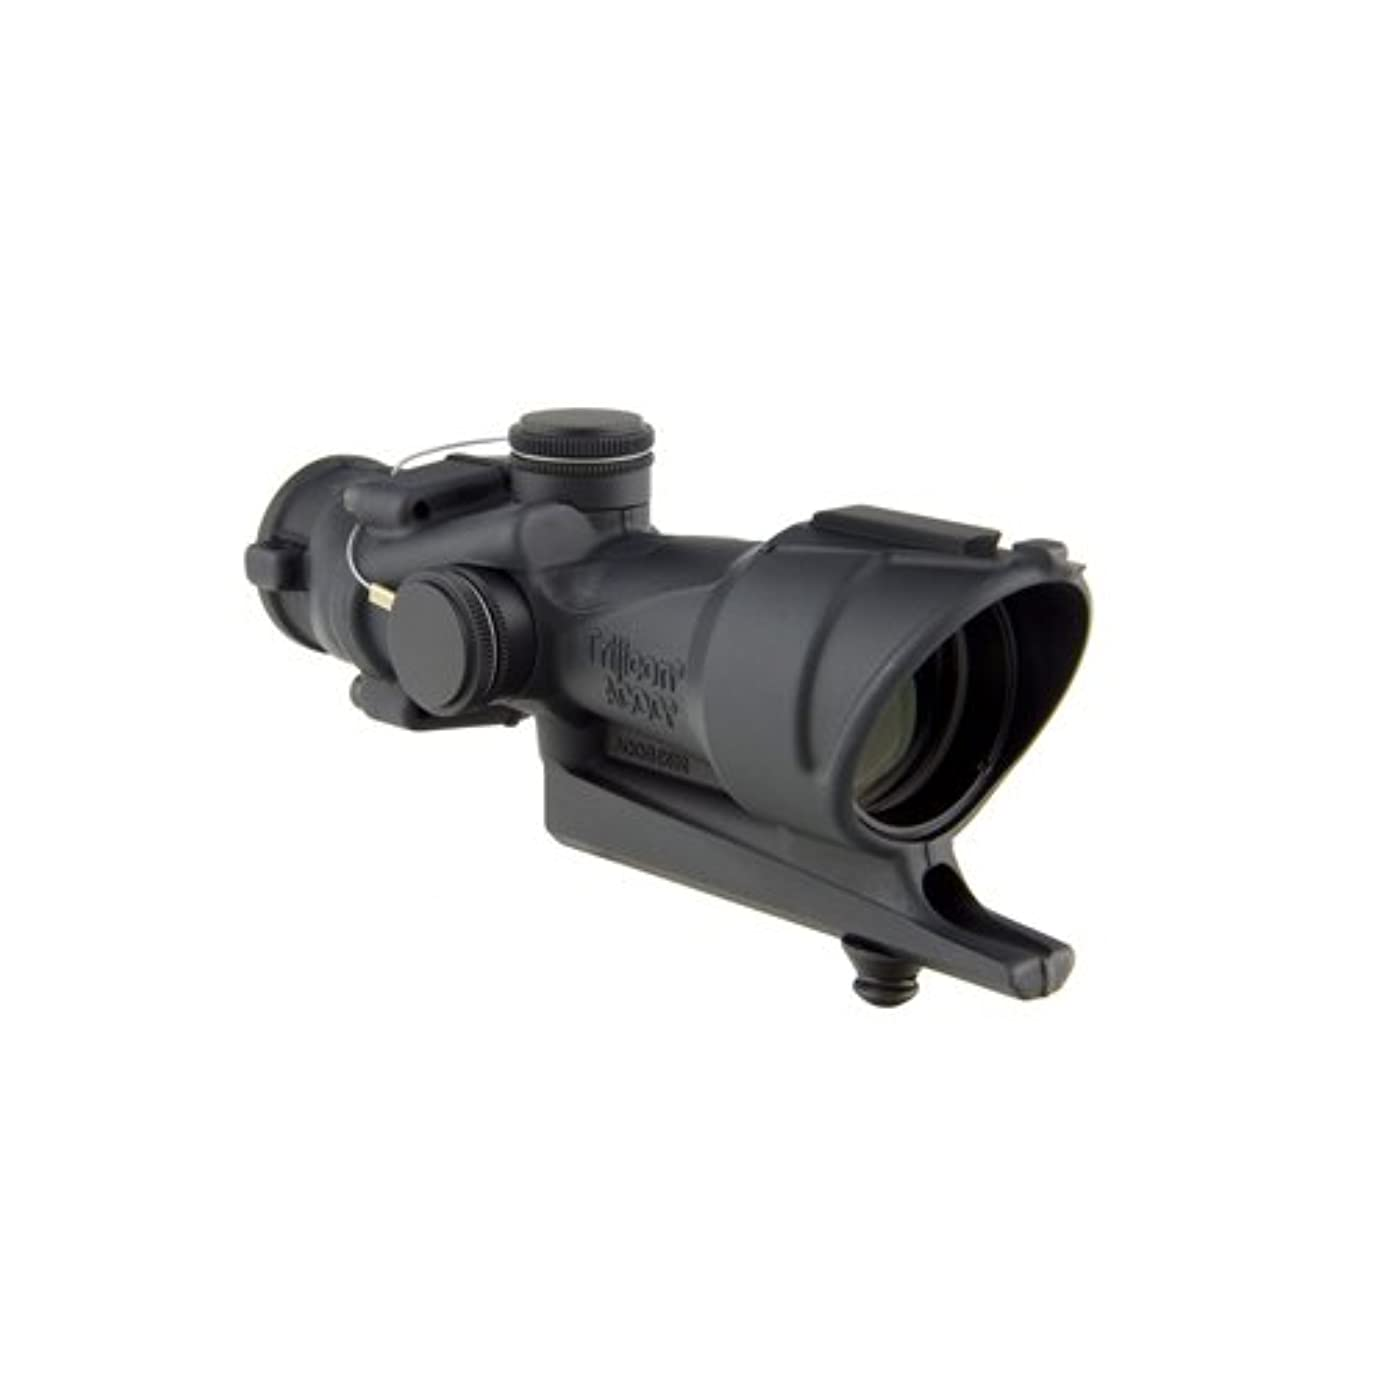 Trijicon ACOG 4x32 Riflescopes